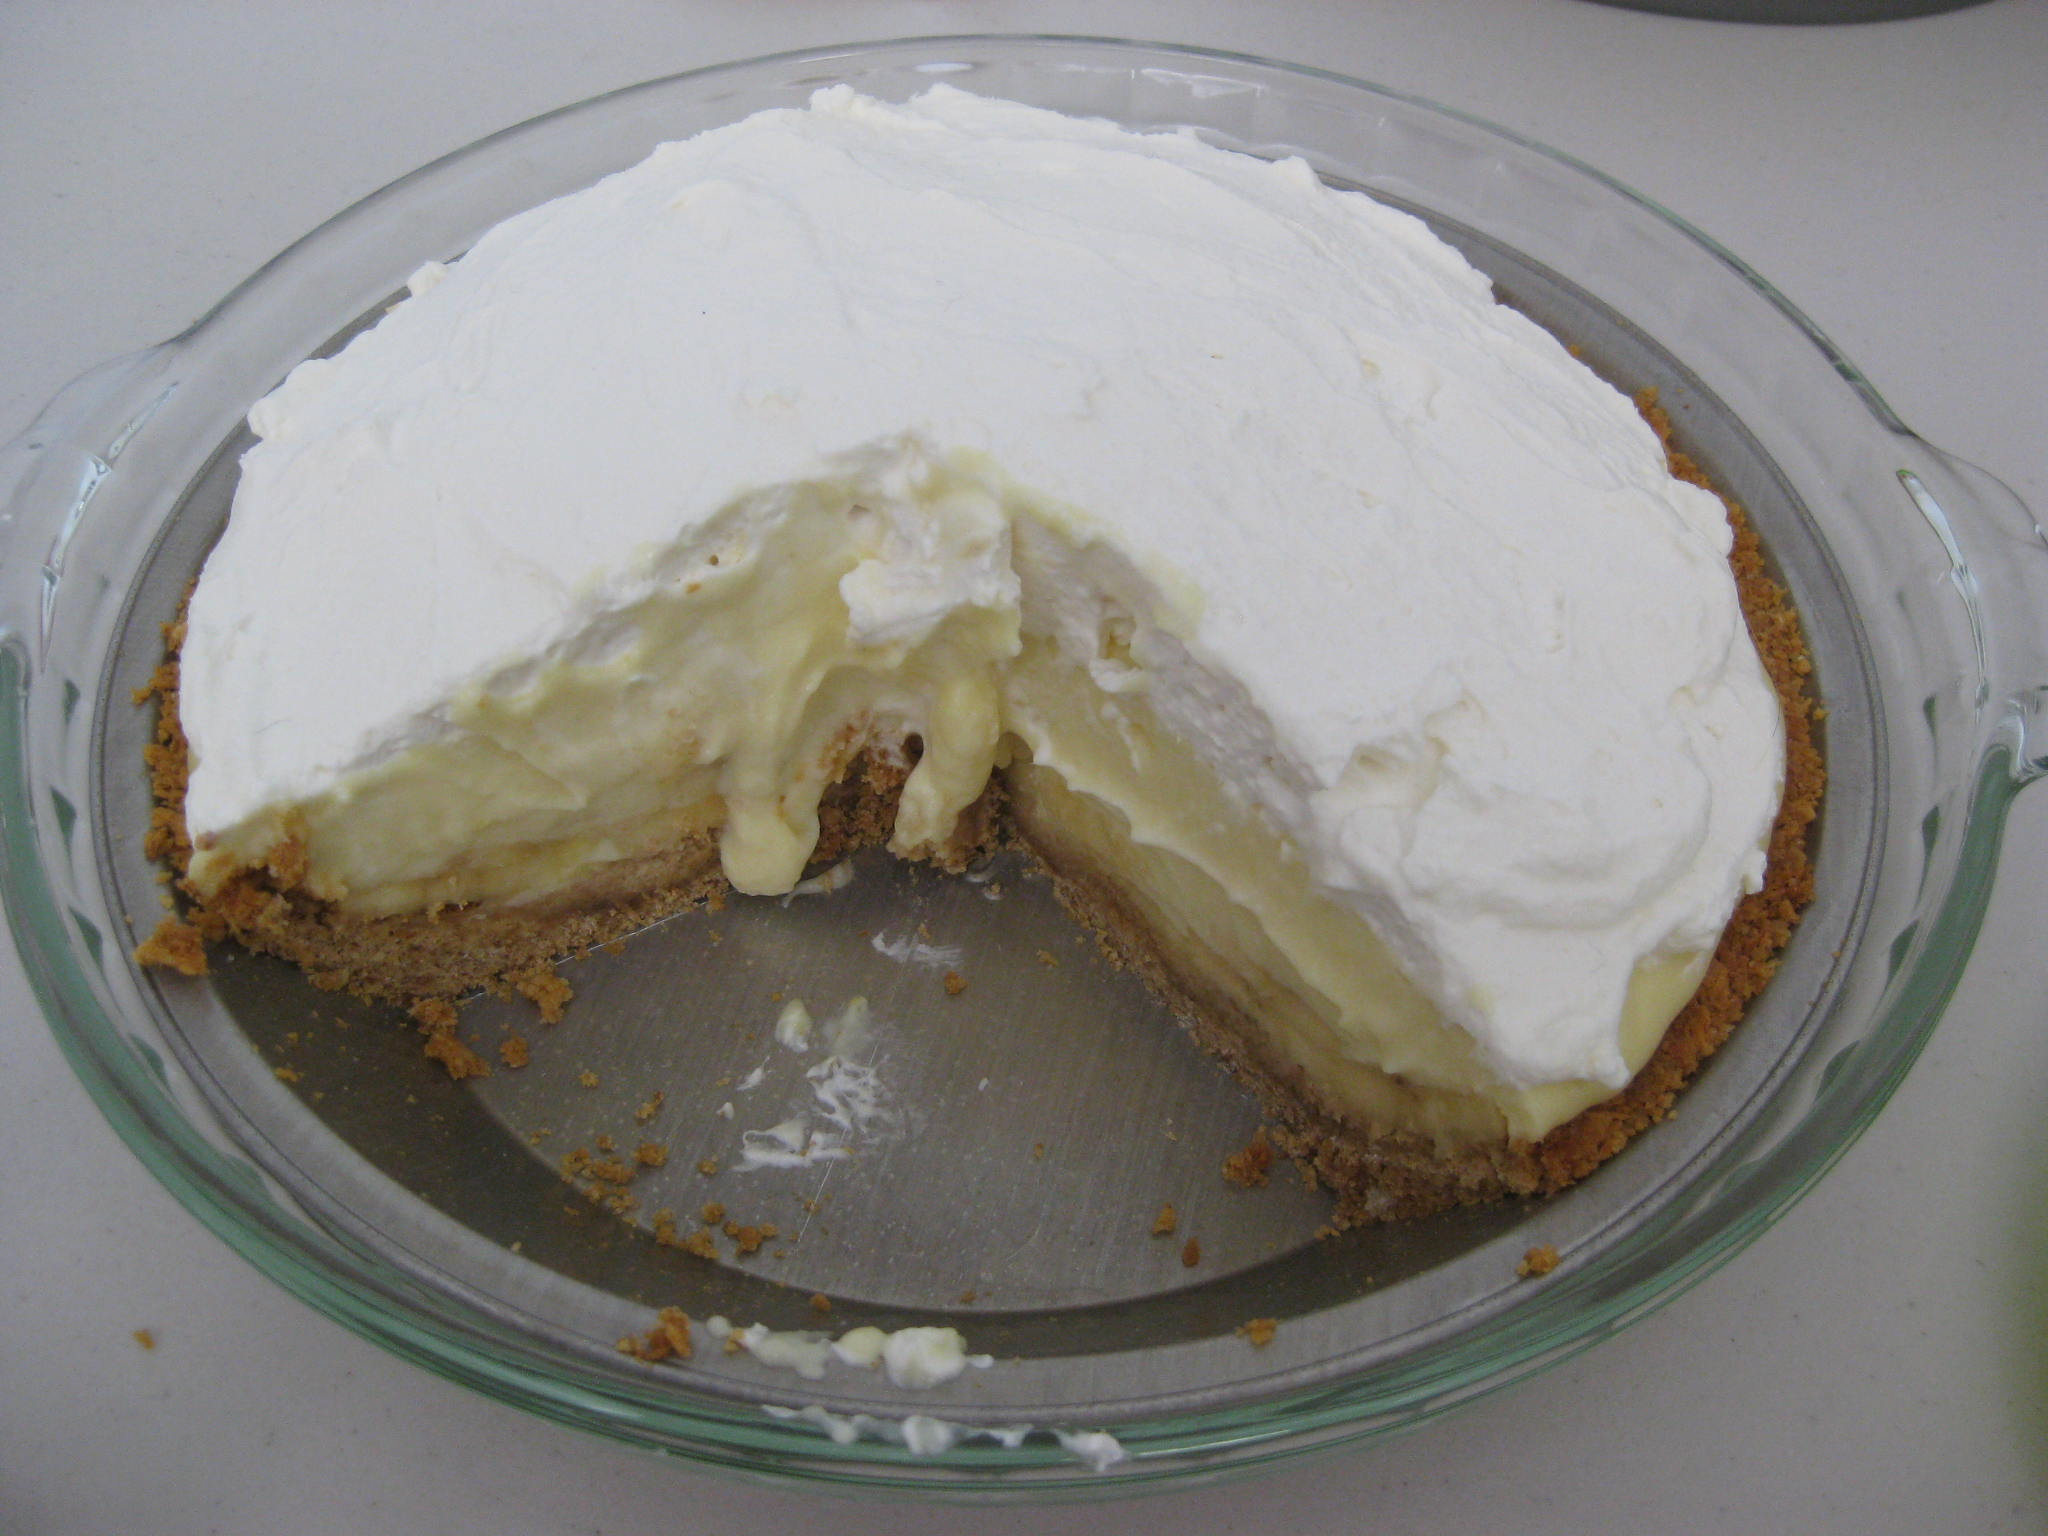 Creampie Pie 51282   Description Banana cream pie with slic